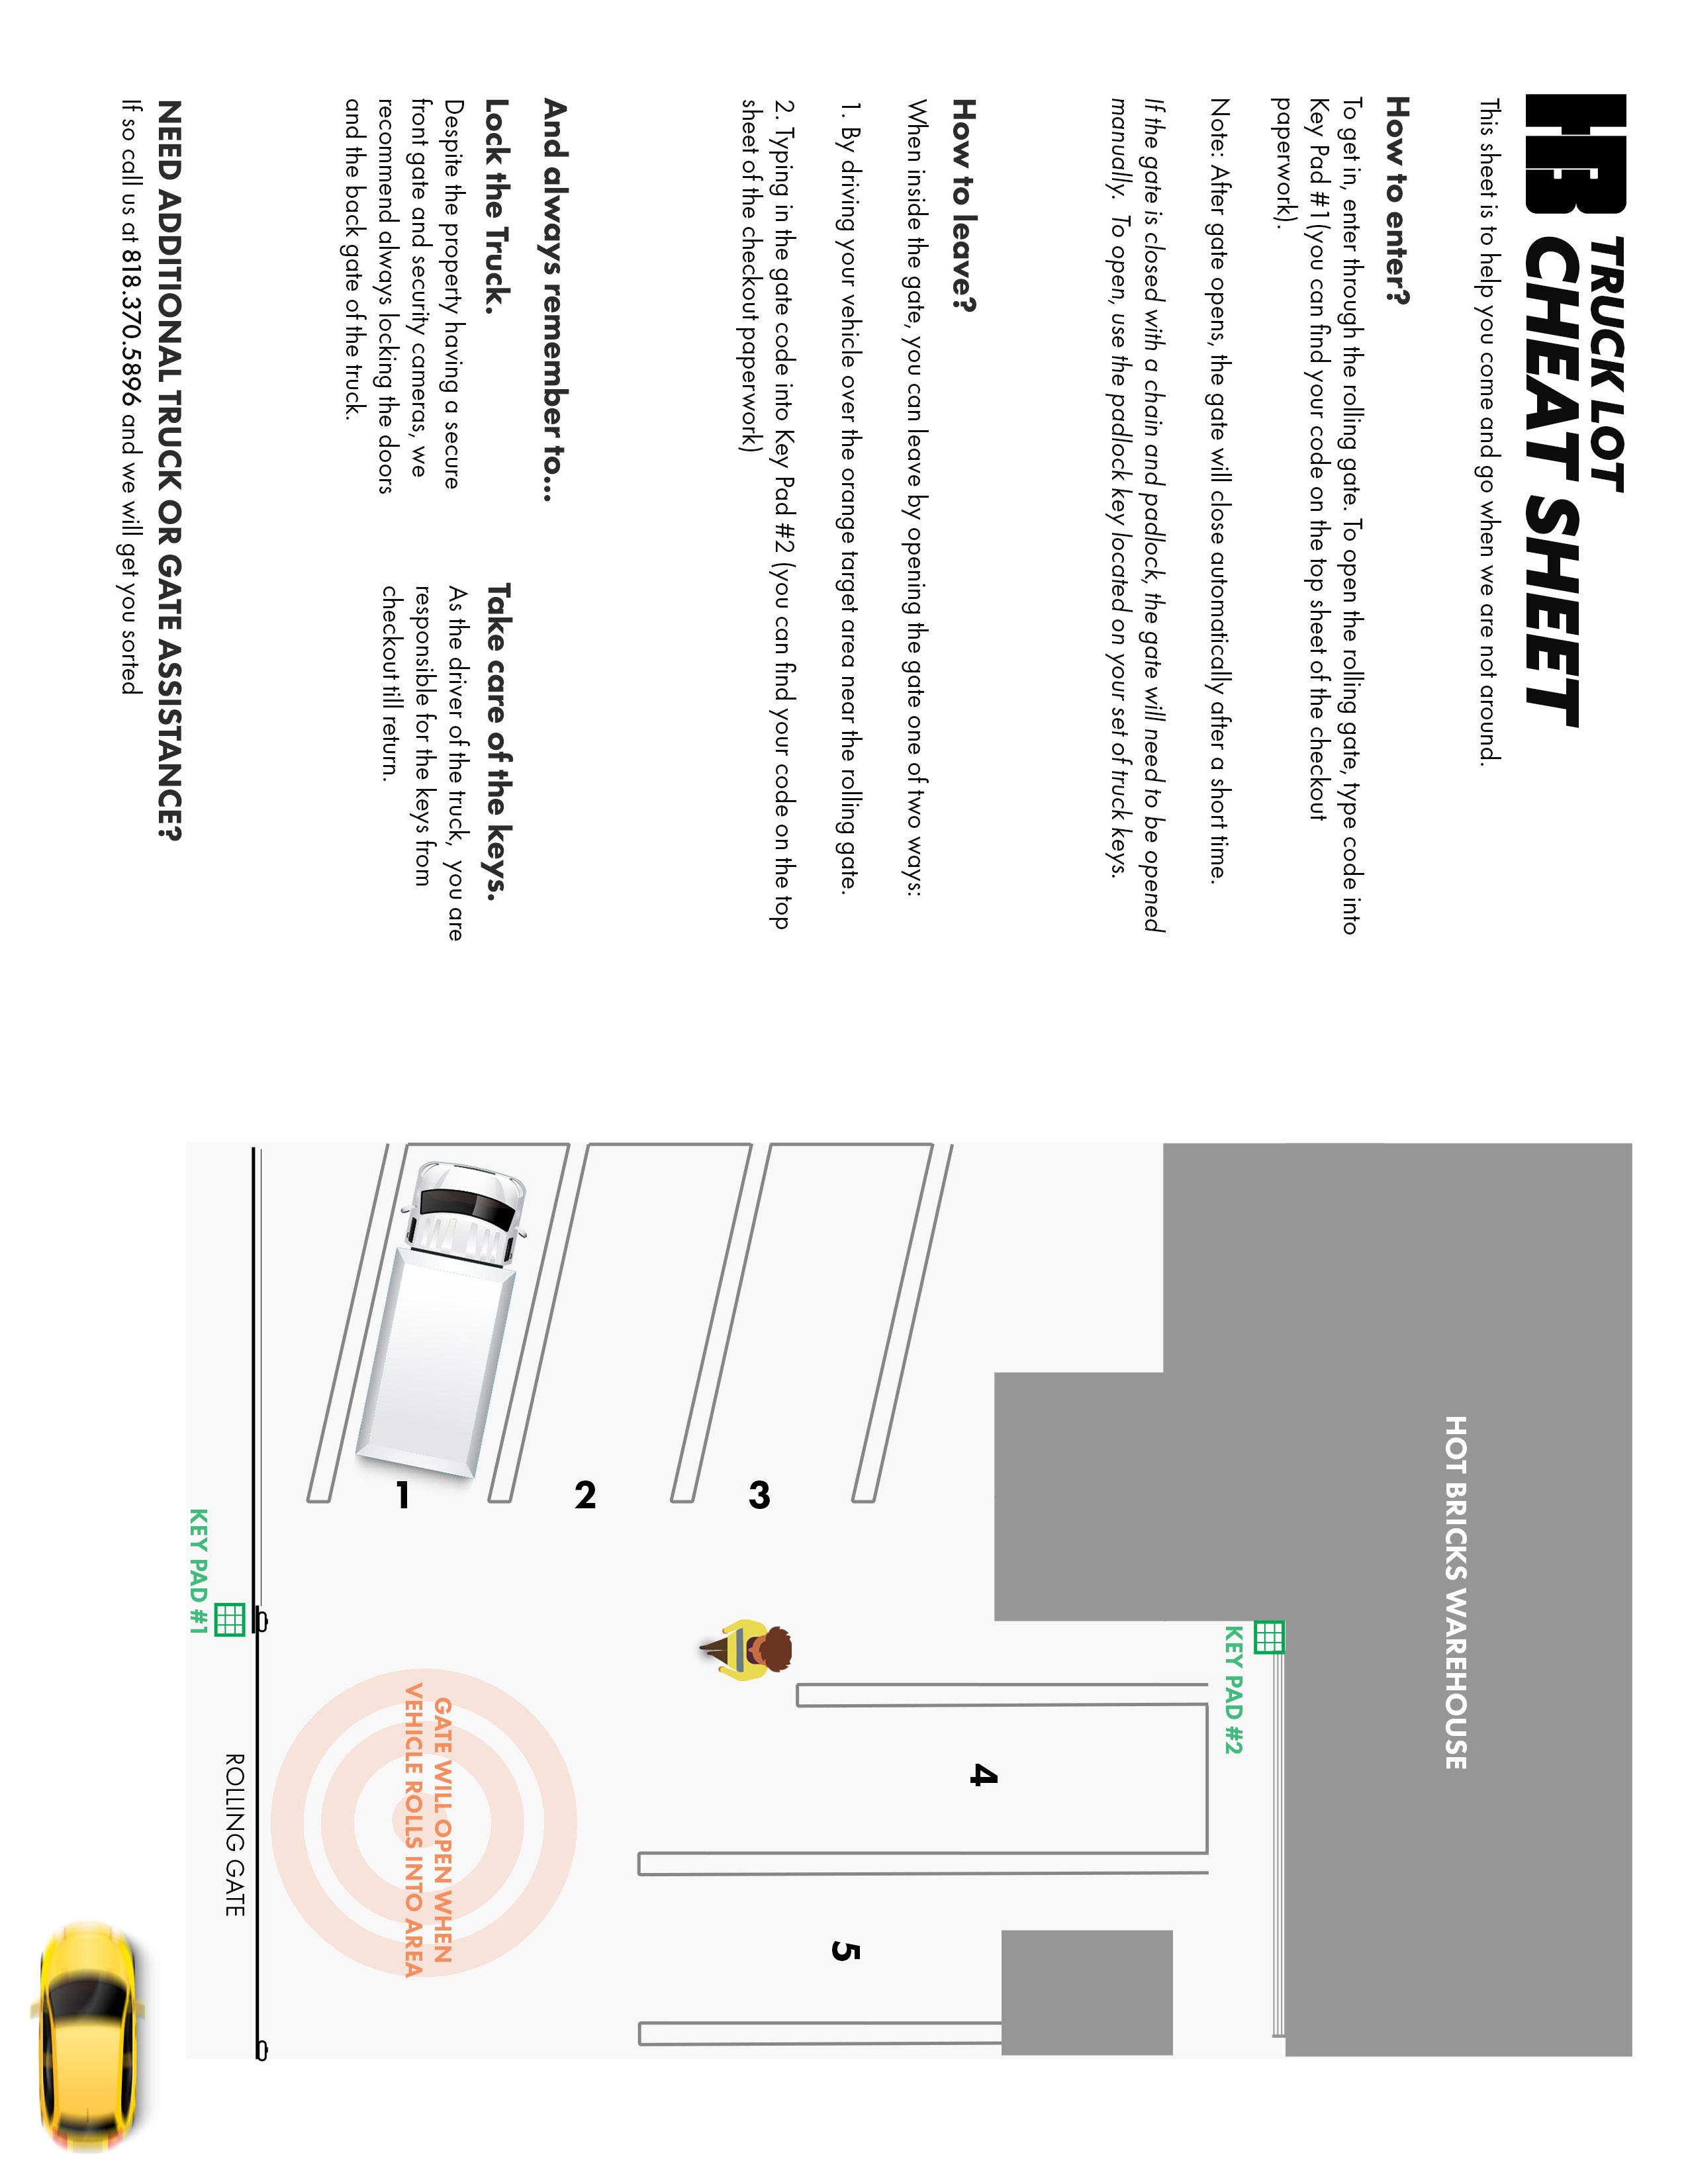 Hot Bricks Truck Lot Cheat Sheet thumb image